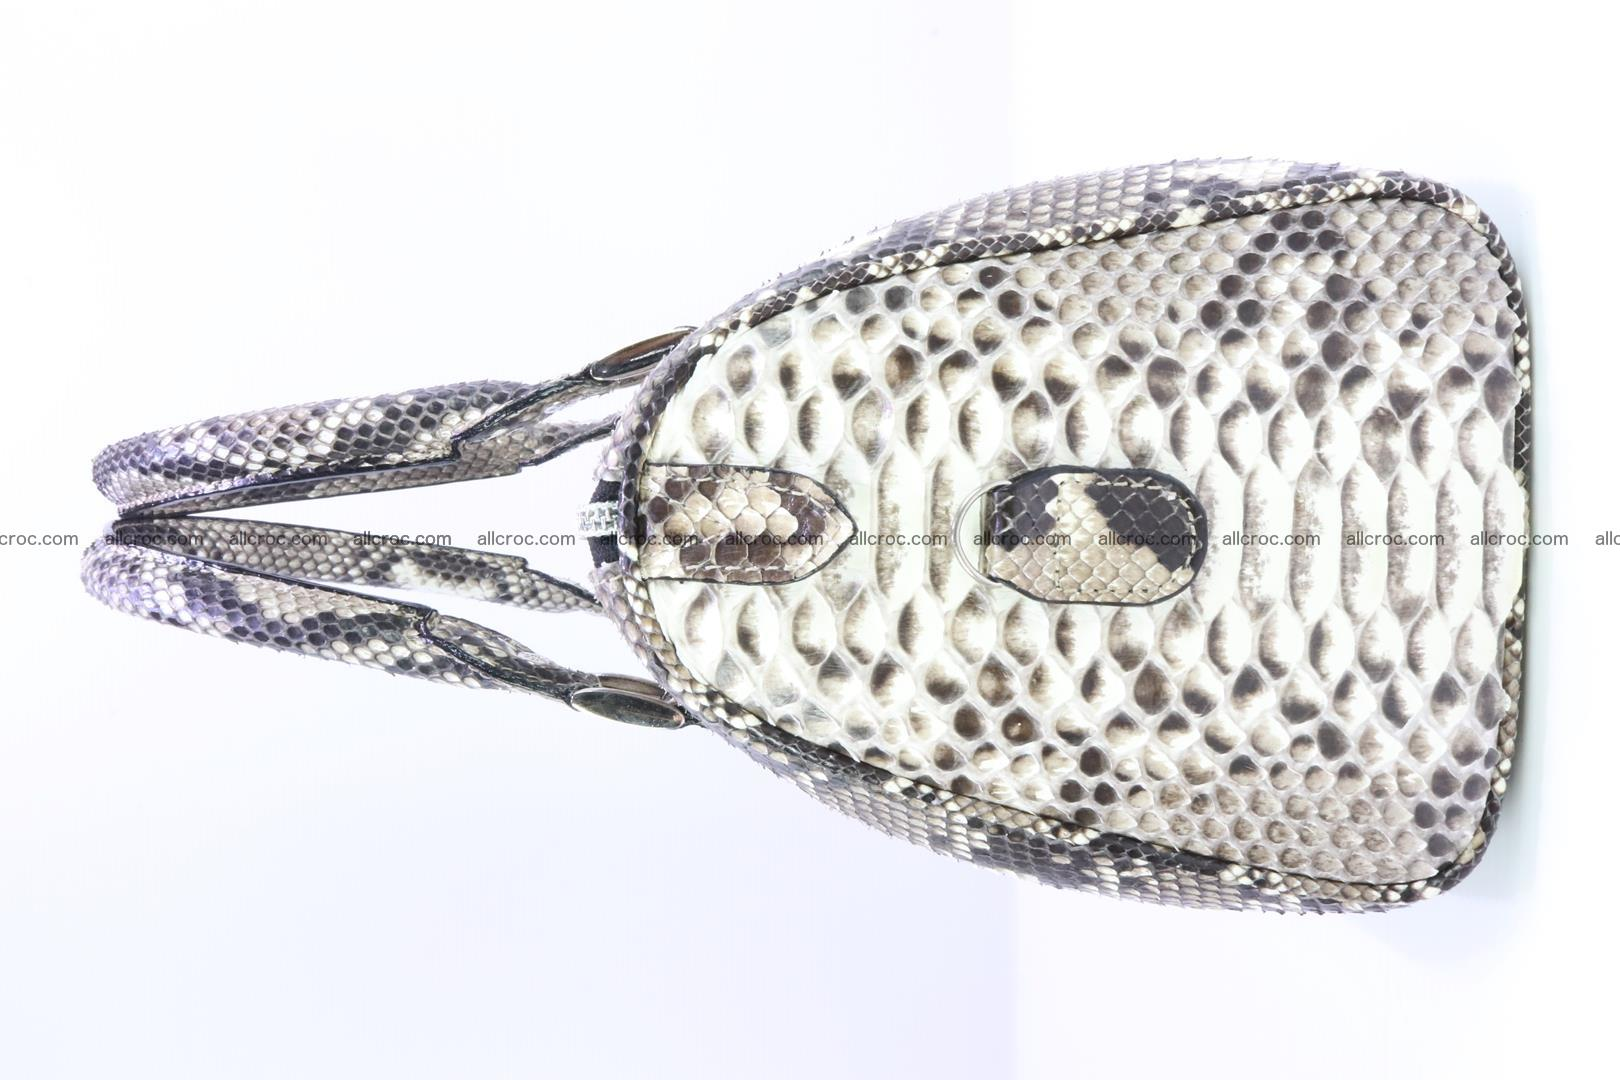 Ladies handbag, valise from genuine python skin MINI 210 Foto 4